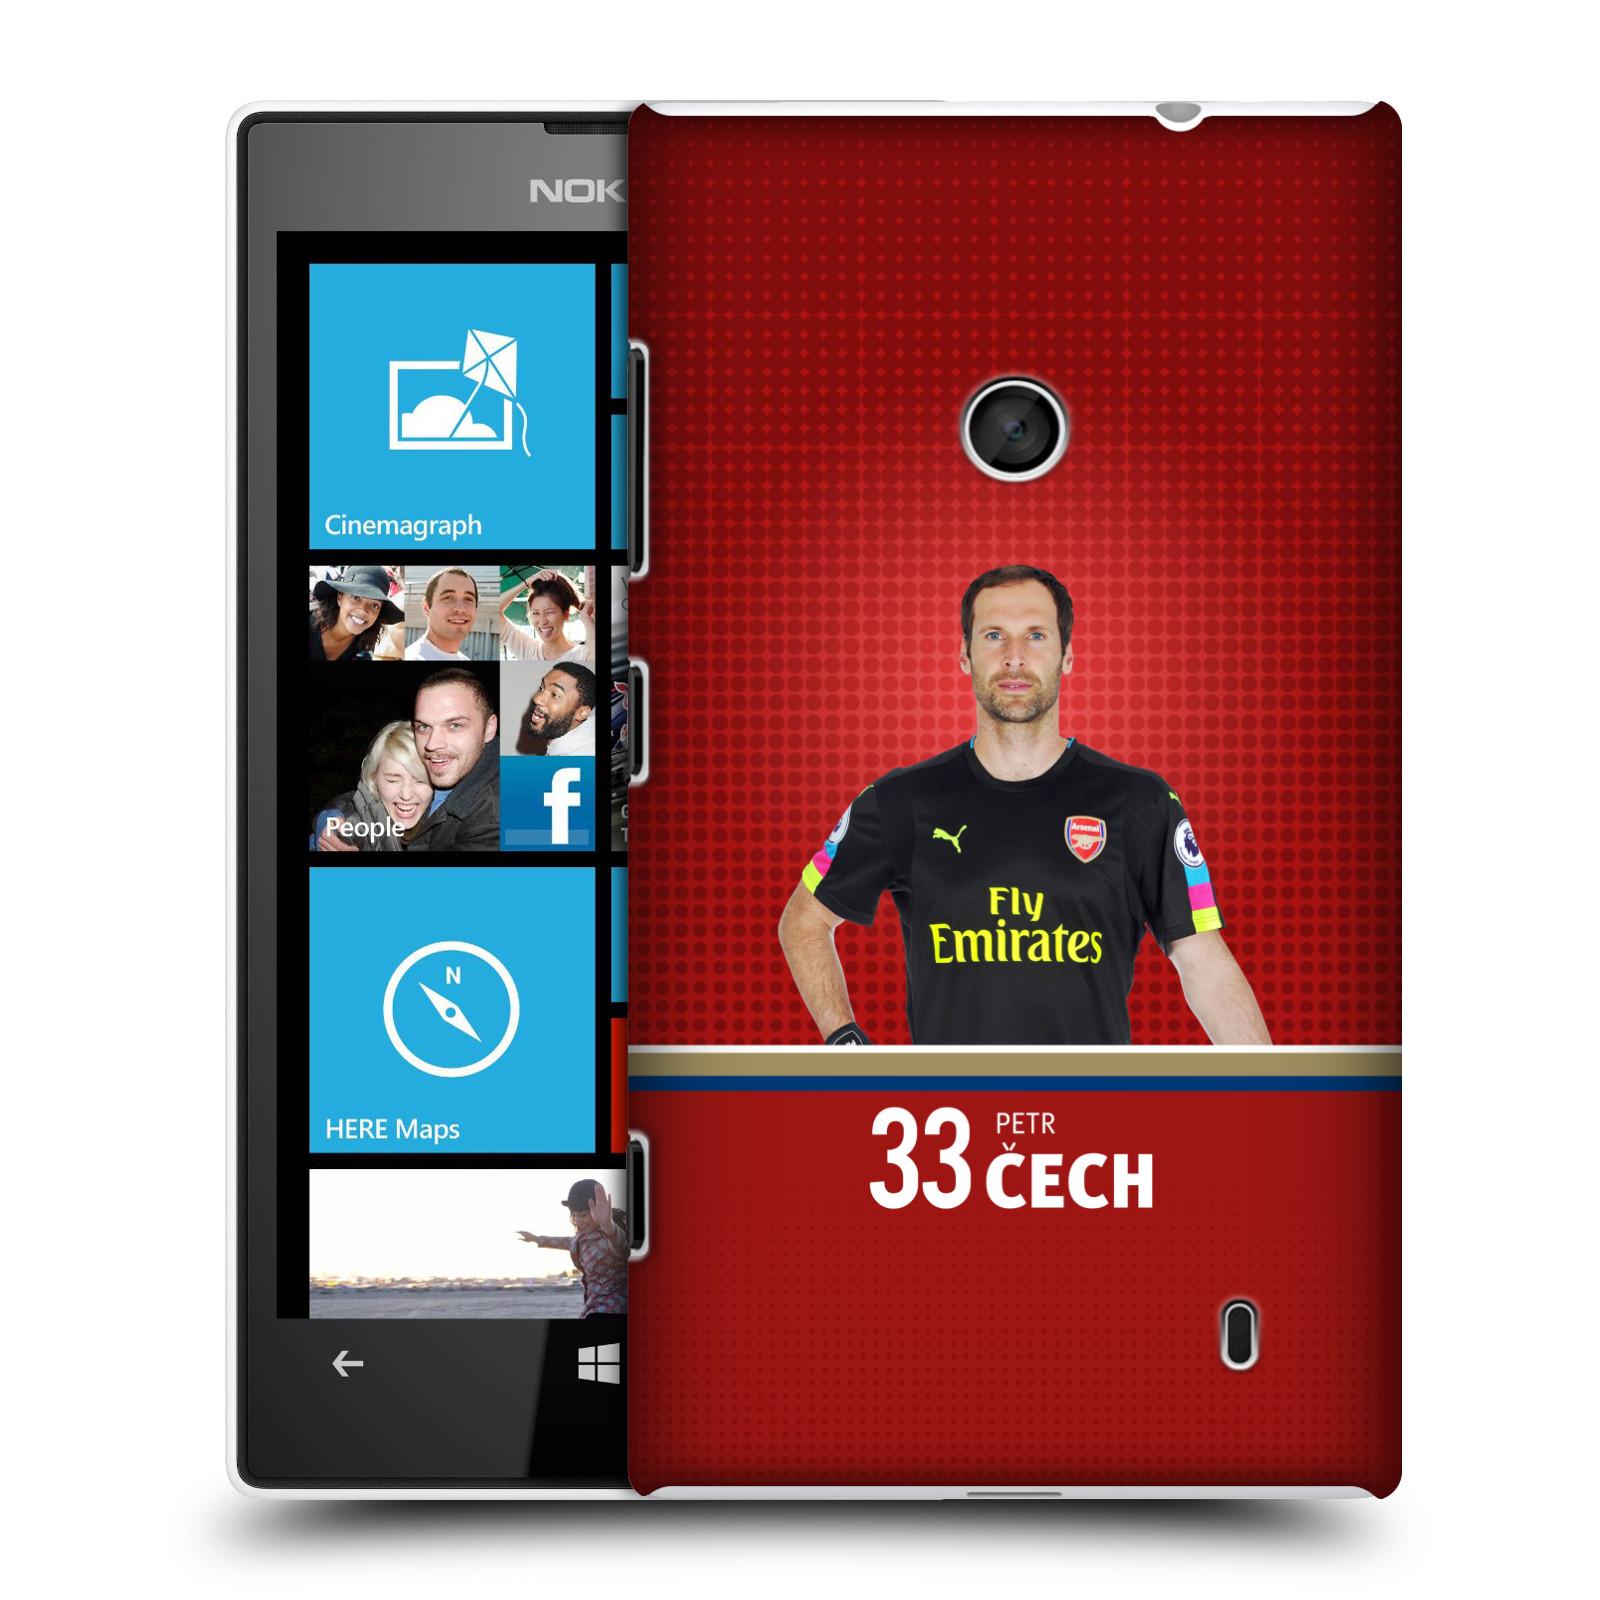 Plastové pouzdro na mobil Nokia Lumia 520 - Head Case - Arsenal FC - Petr Čech